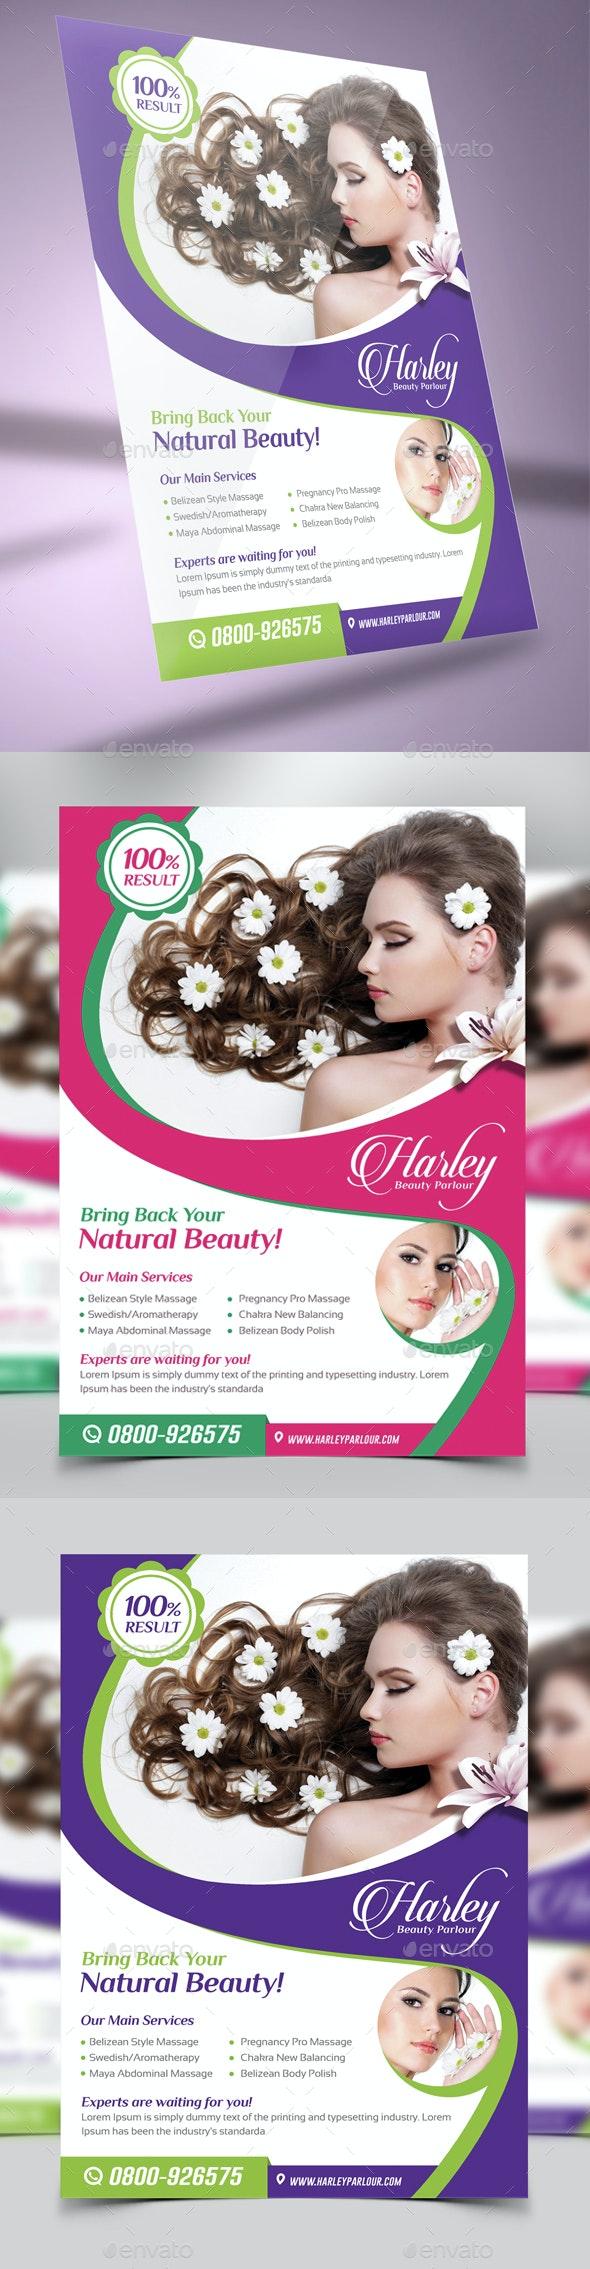 Beauty Salon Flyer - Corporate Business Cards